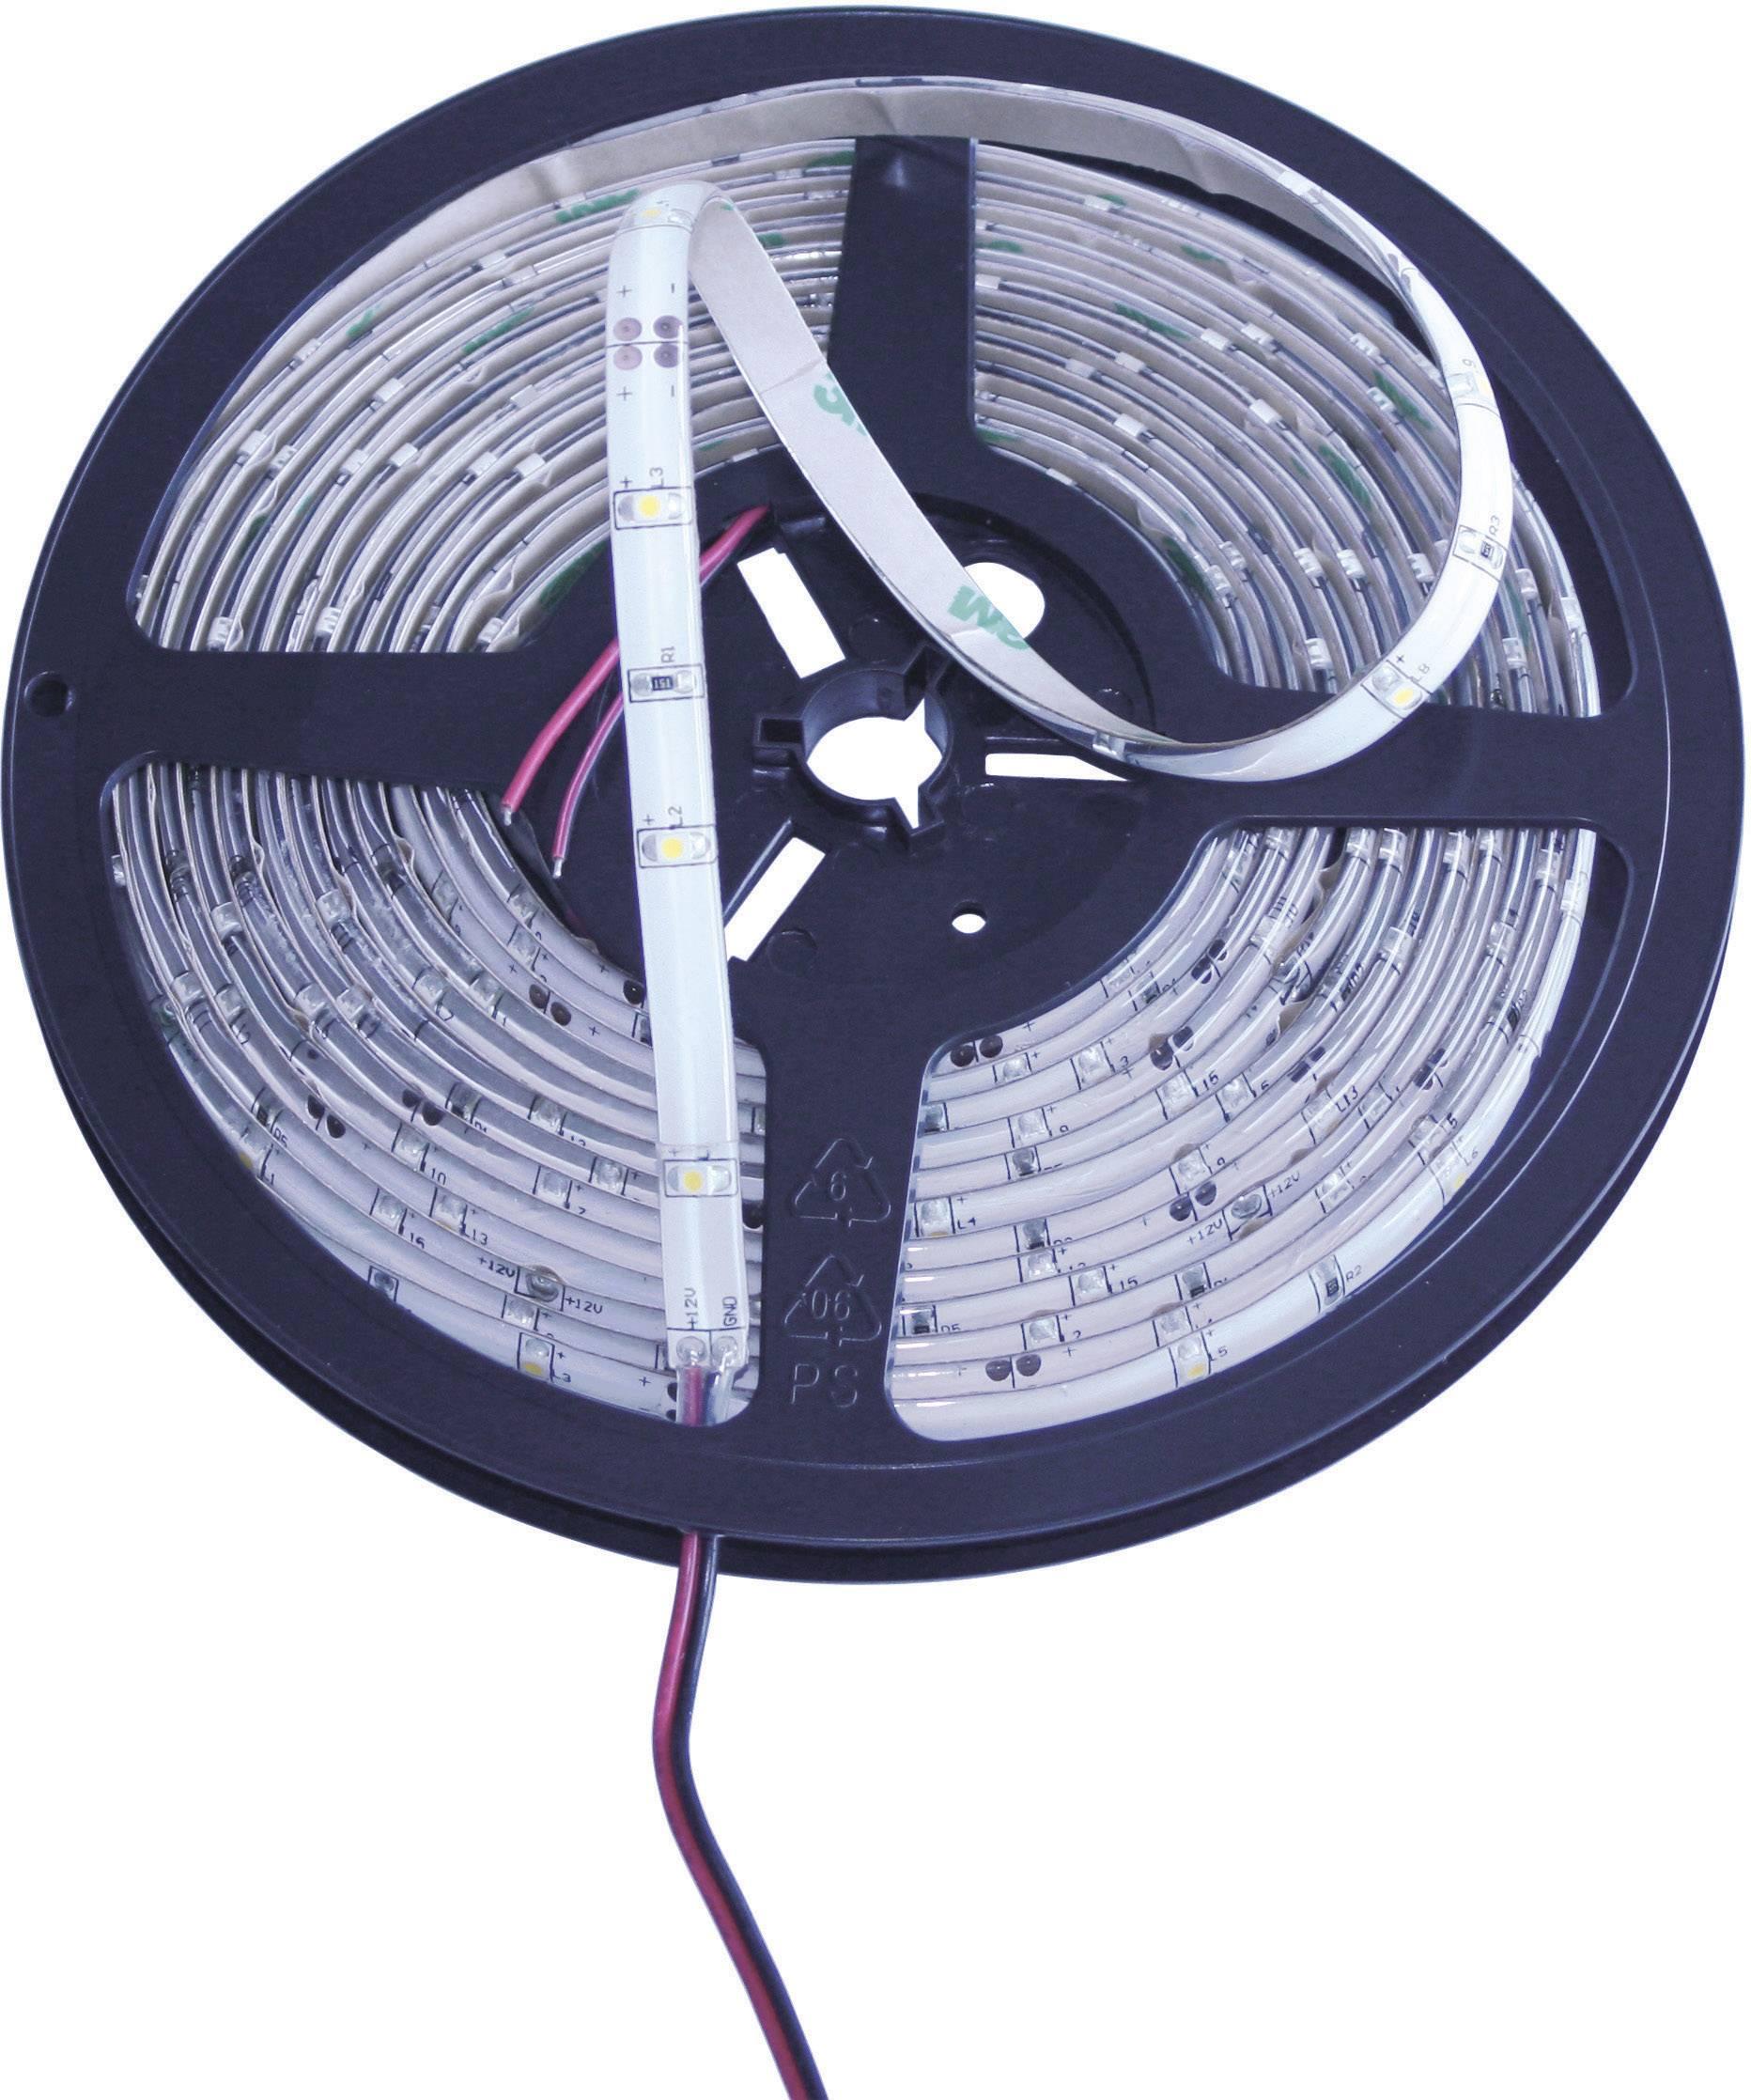 LED pásik Barthelme Y51516225 184208, 12 V, biela, 500 cm